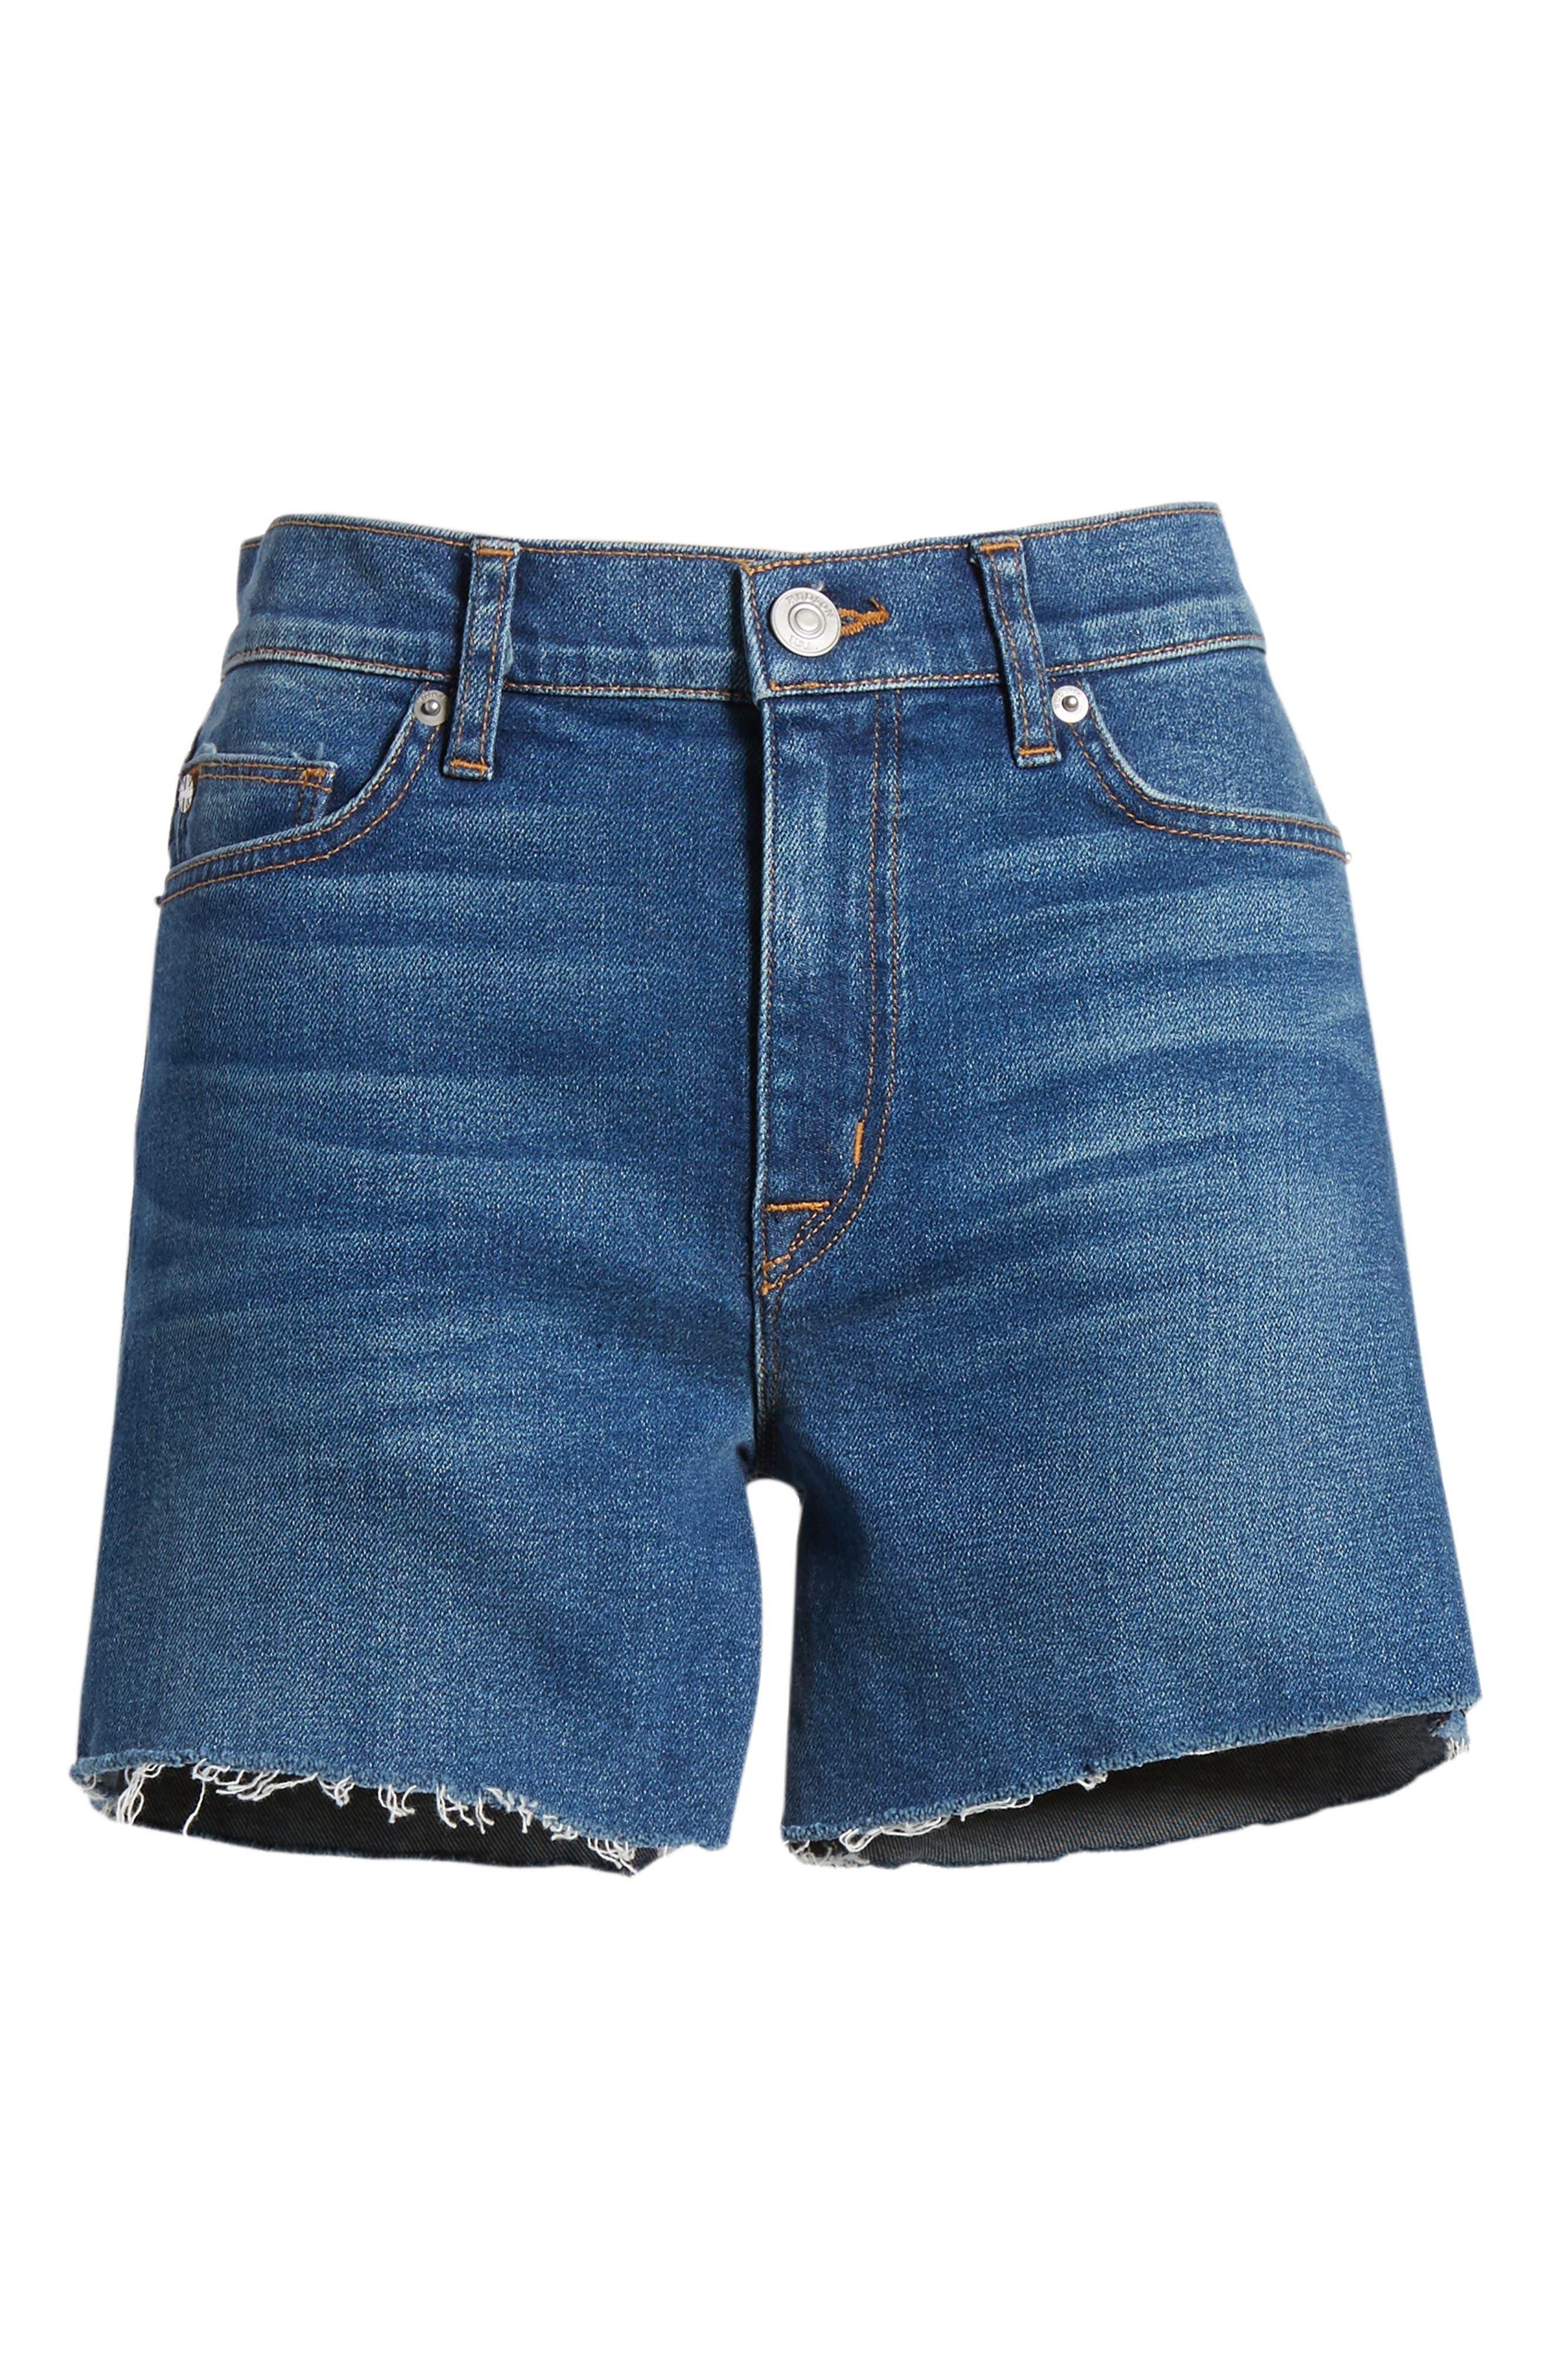 Valeri Cutoff Denim Shorts,                             Alternate thumbnail 7, color,                             421